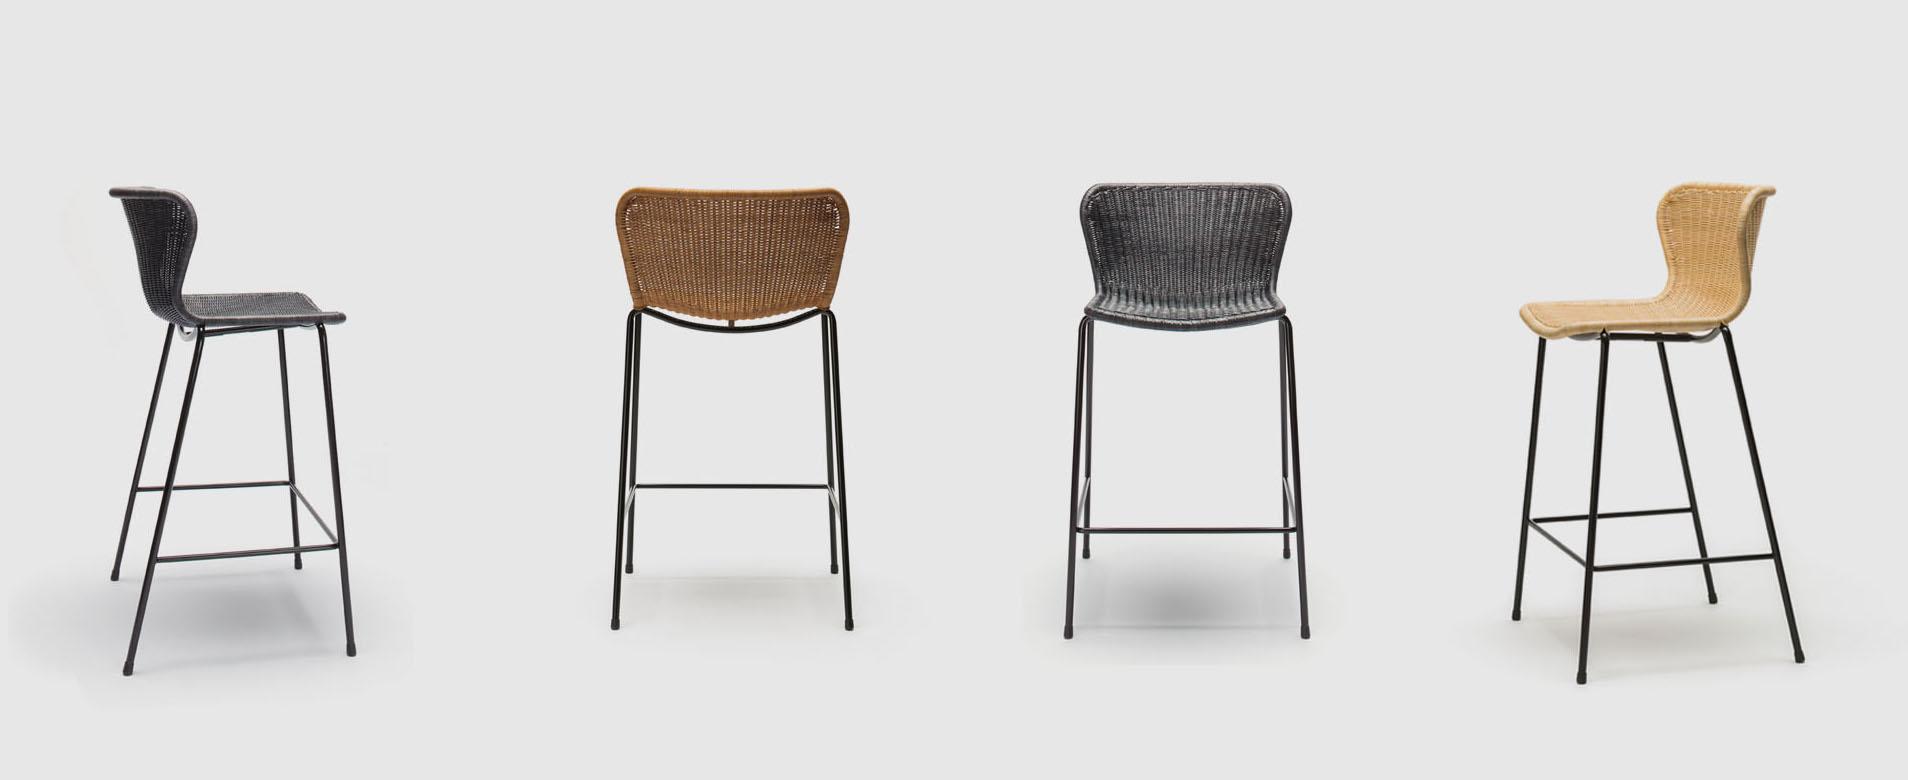 c603-stool-indoor-rowof4.jpg